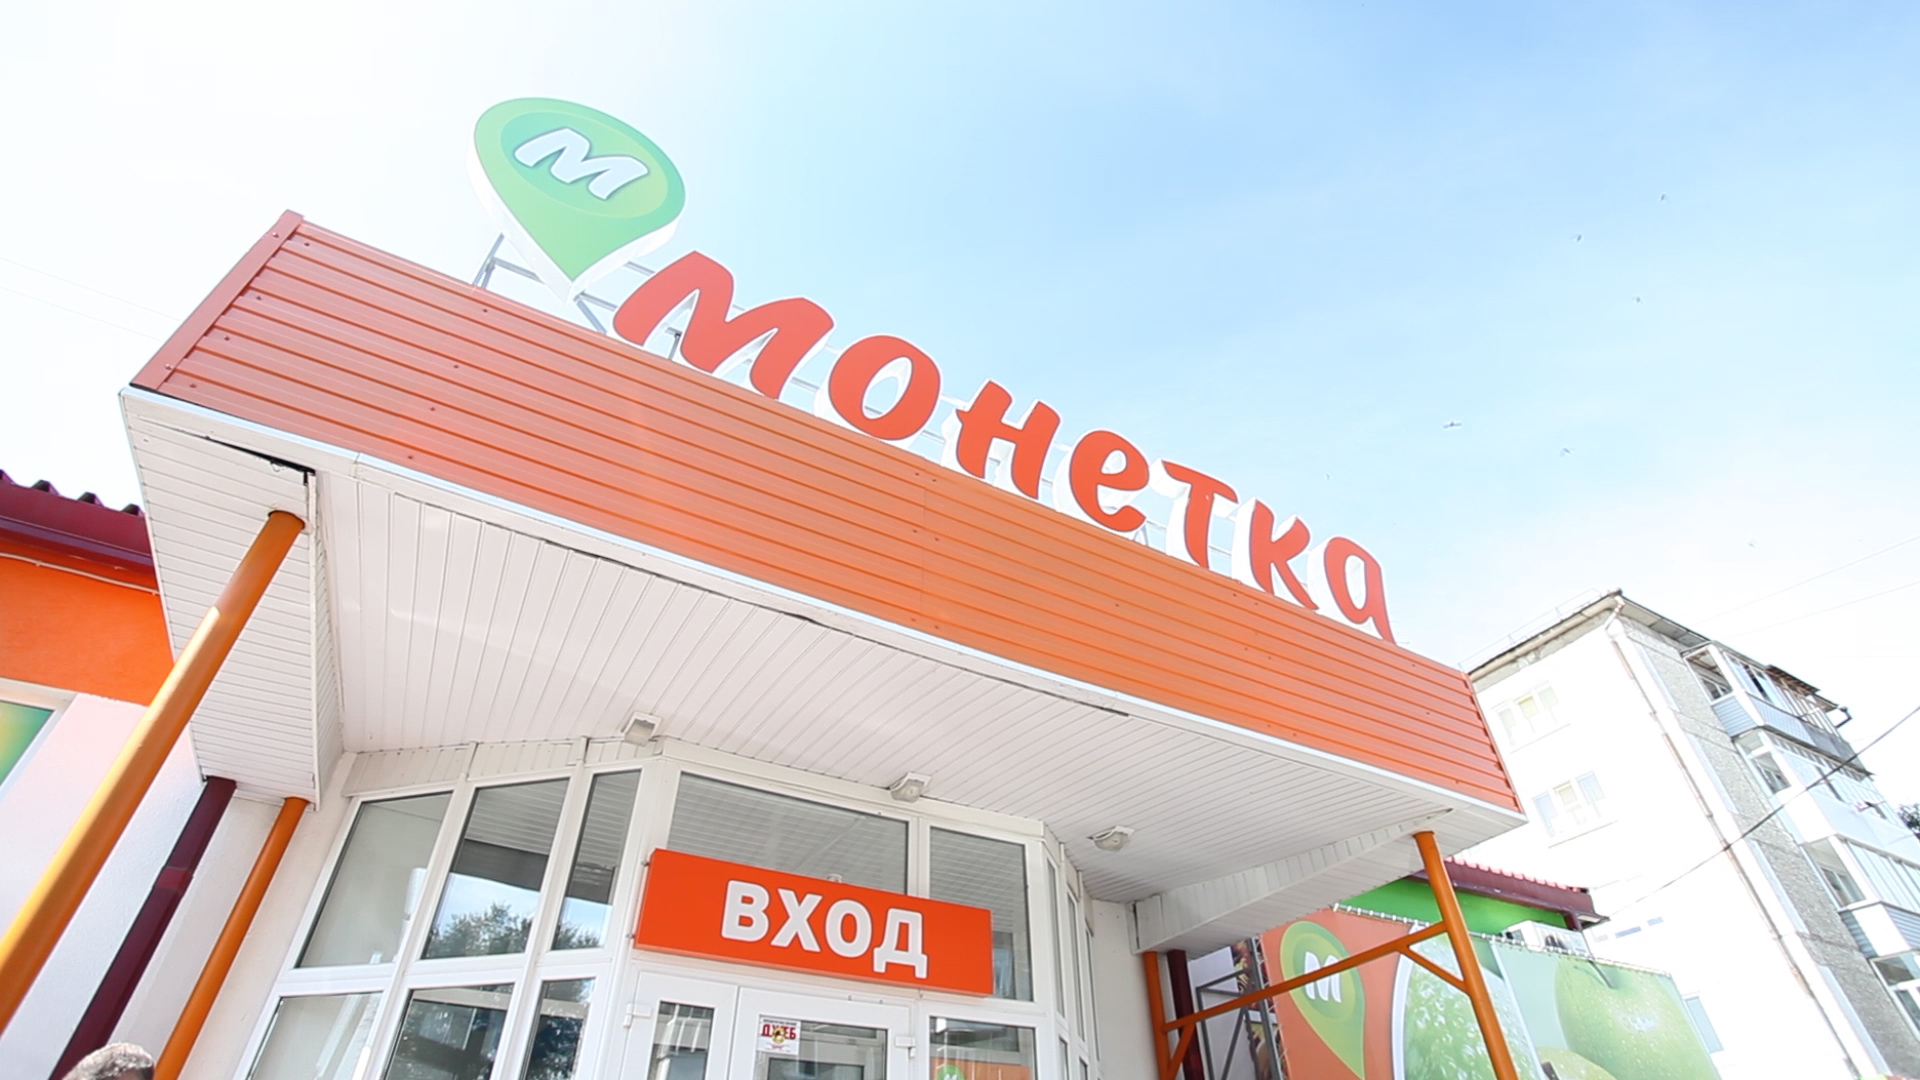 Роспотребнадзор оштрафовал на 140 тыс. рублей «Монетку» на Крауля